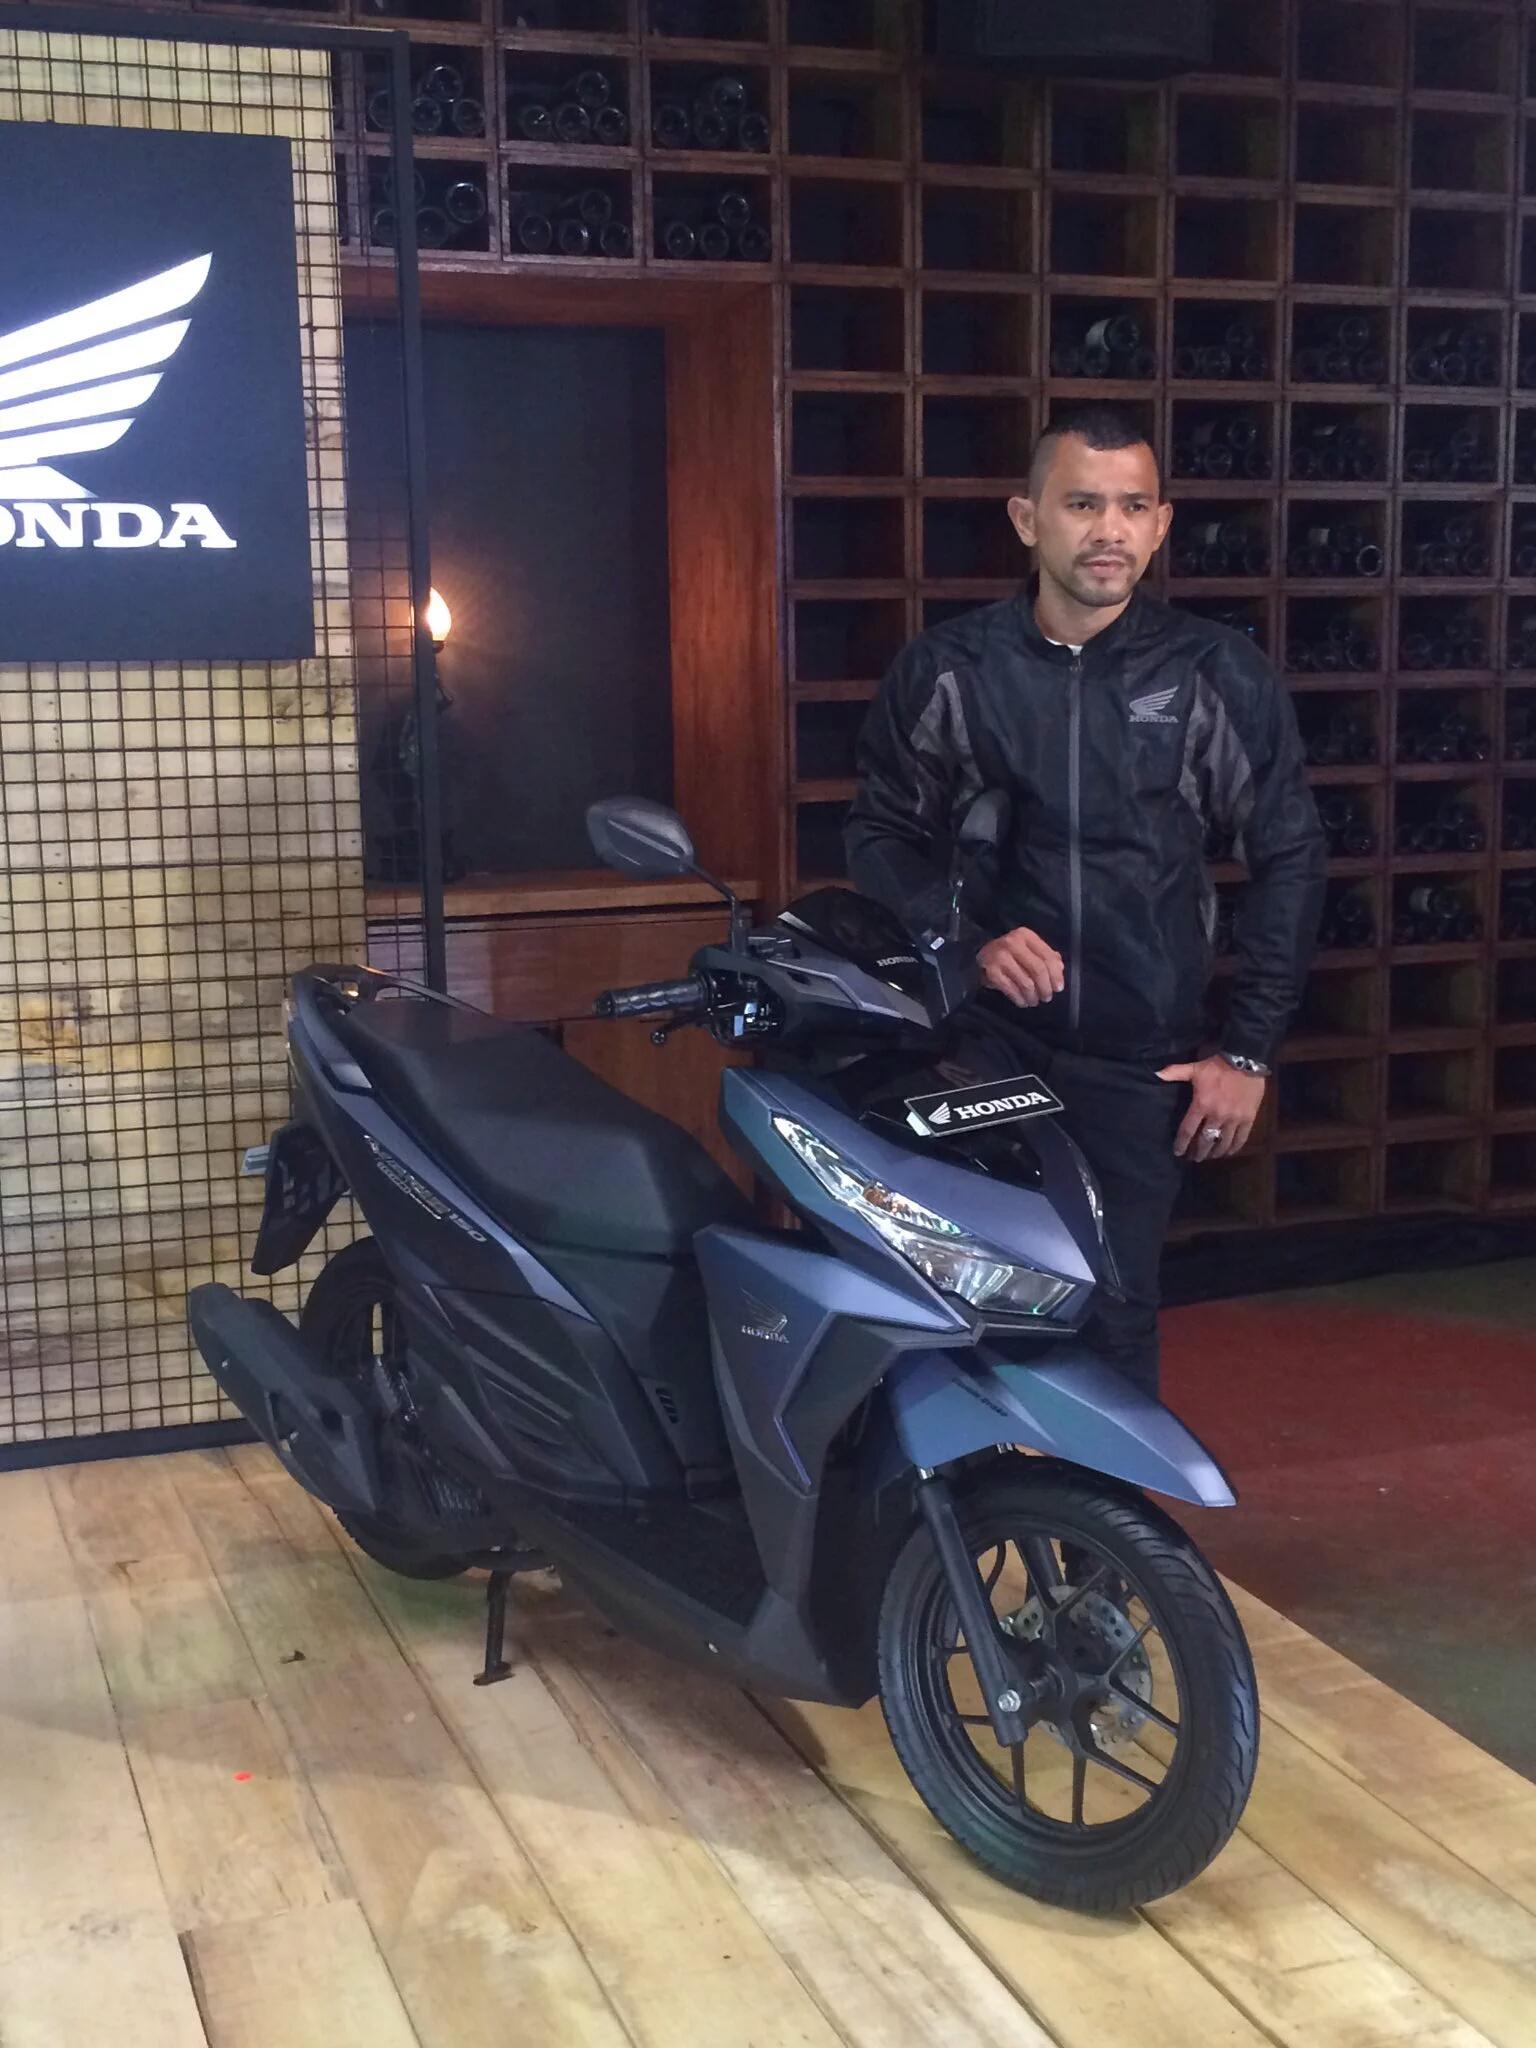 Bukan Supra X150, Melainkan Vario 150 Facelift lah yang dirilis Honda Hari ini…